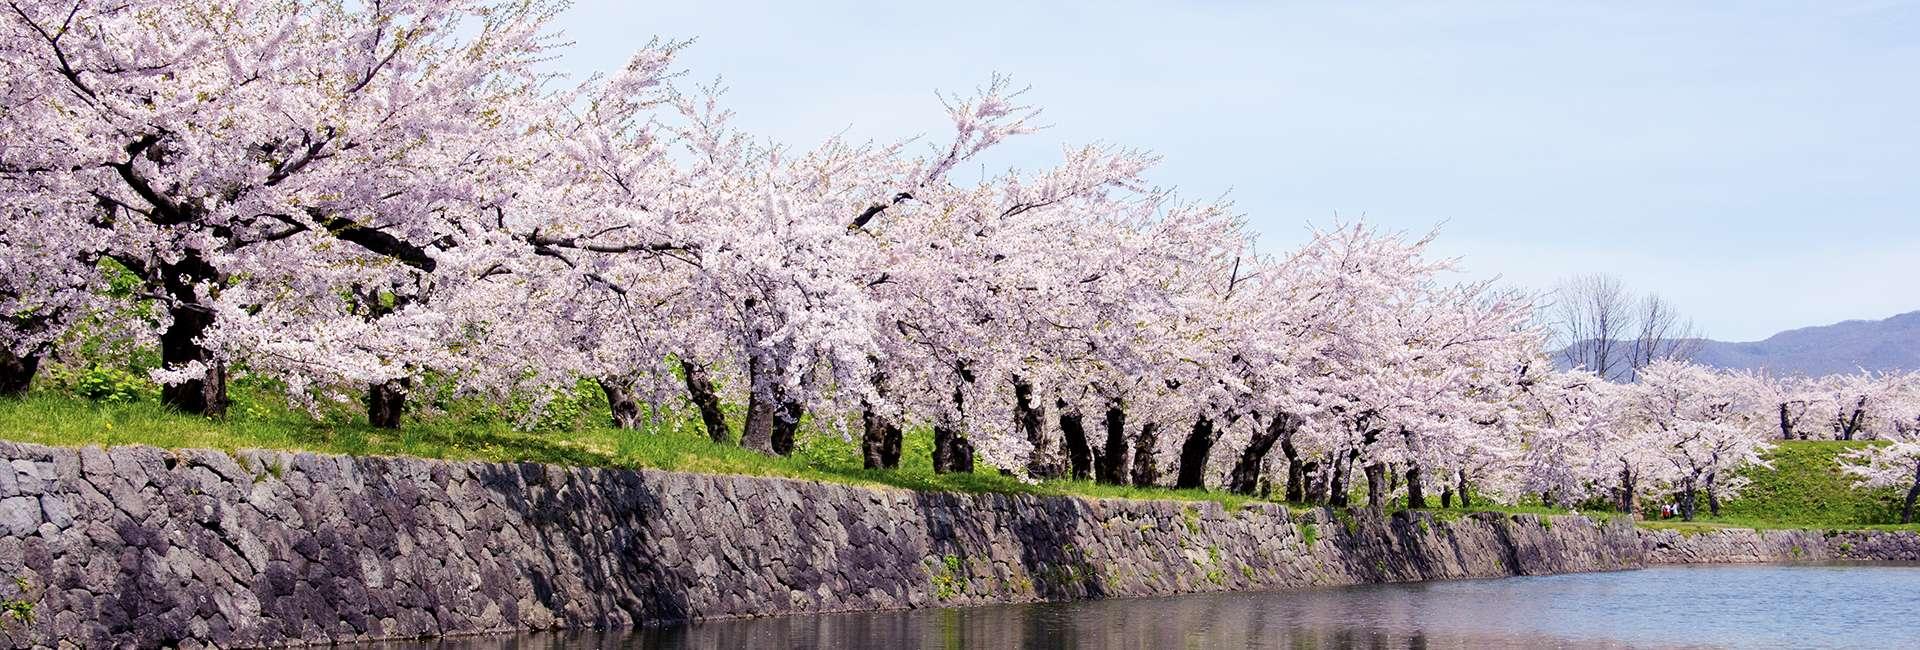 cerisiers en fleur à Hakodate